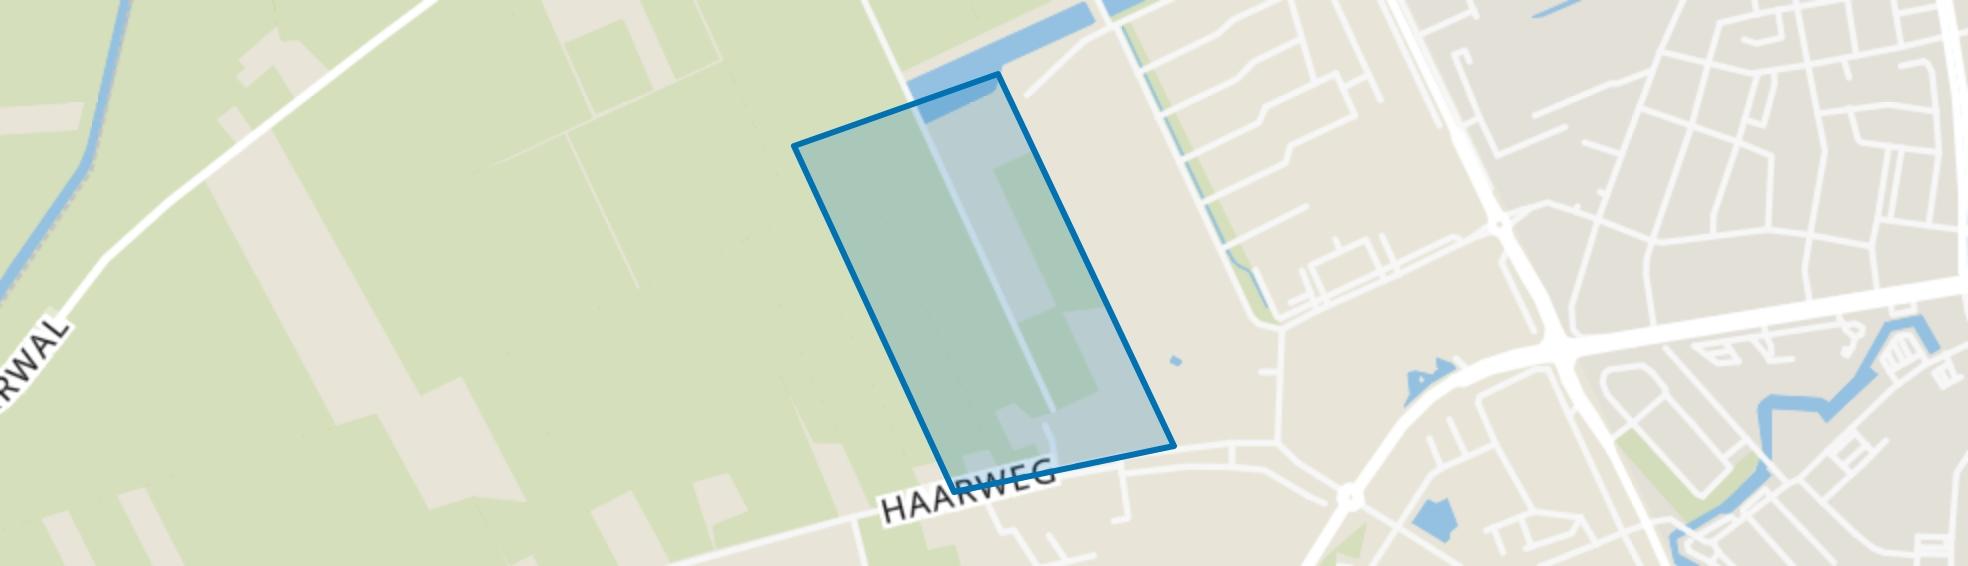 Kortenoord-West, Wageningen map